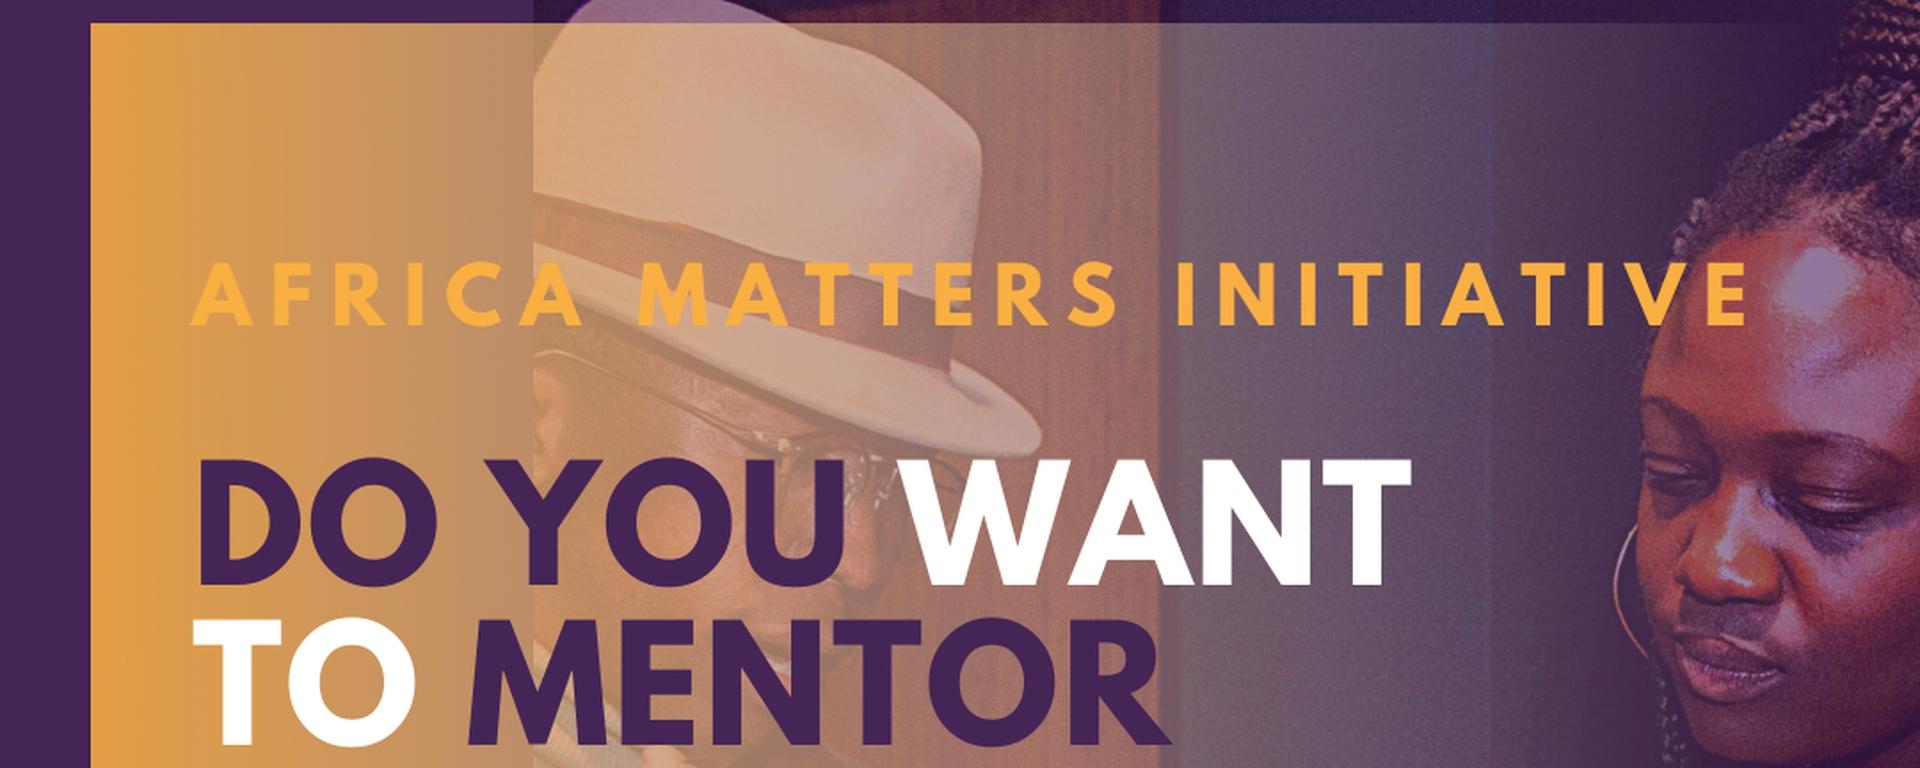 Africa Matters Initiative - Africa Matters Ambassadors Program Movemeback African initiative cover image